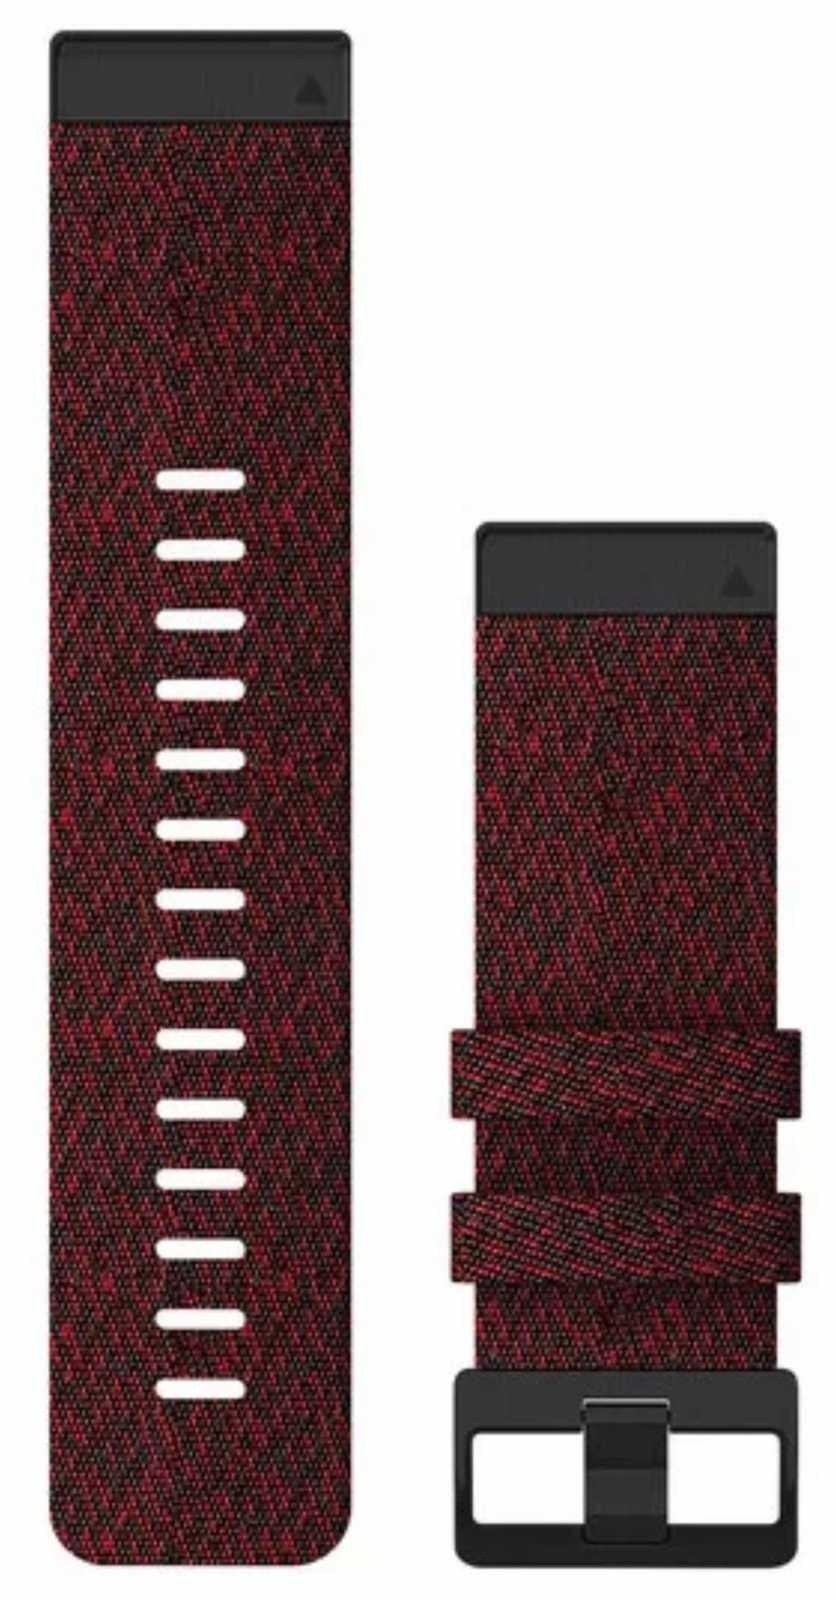 Garmin QuickFit 26 Watch Strap Only, Heathered Red Nylon 010-12864-06